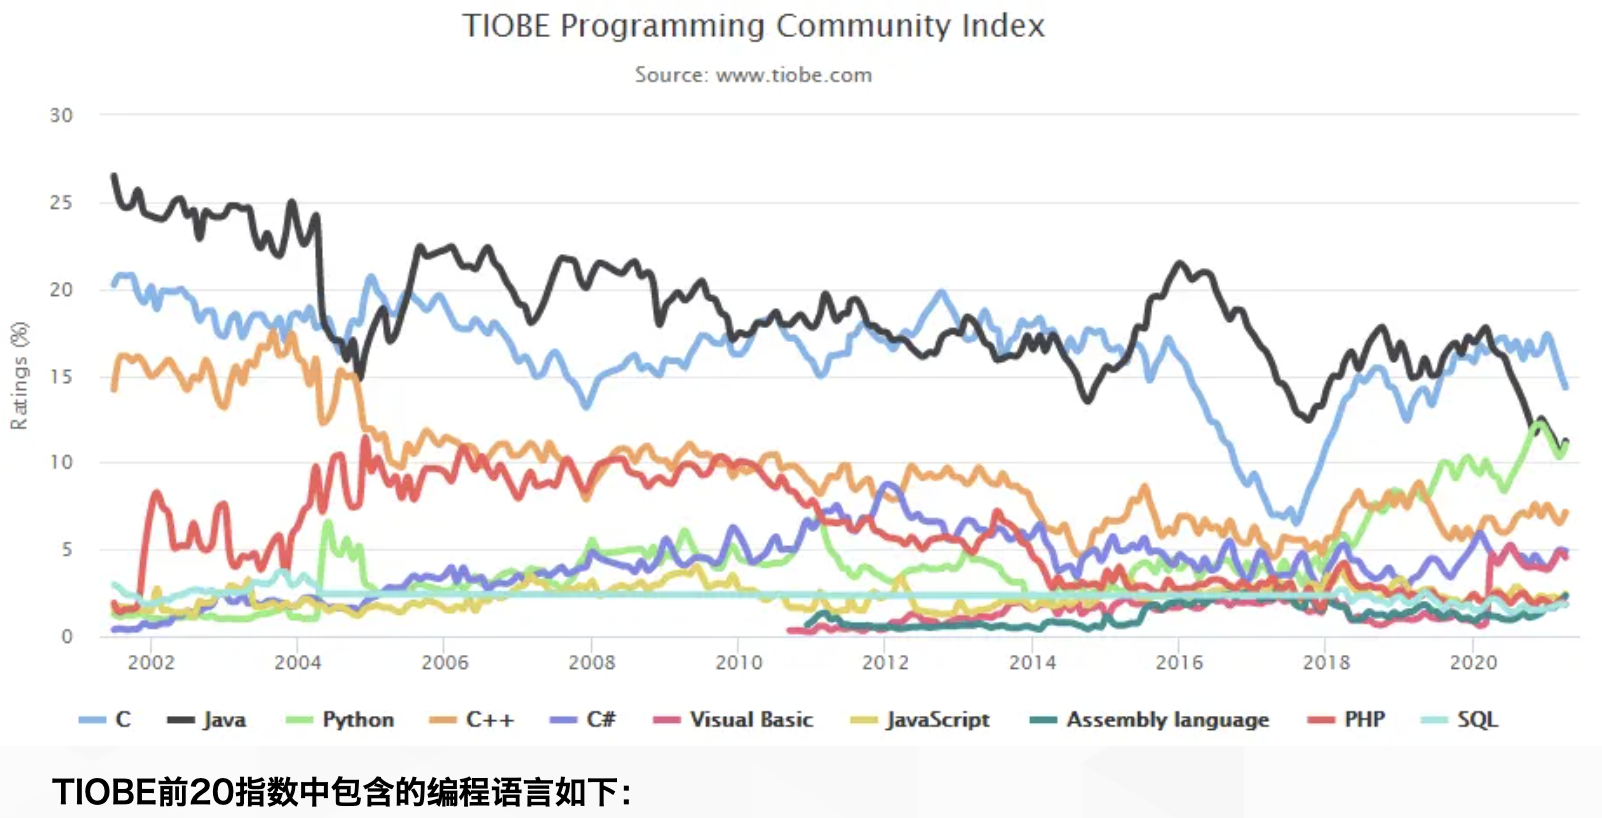 TIOBE:2021年4月全球编程语言排行榜 Fortran意外重回前20